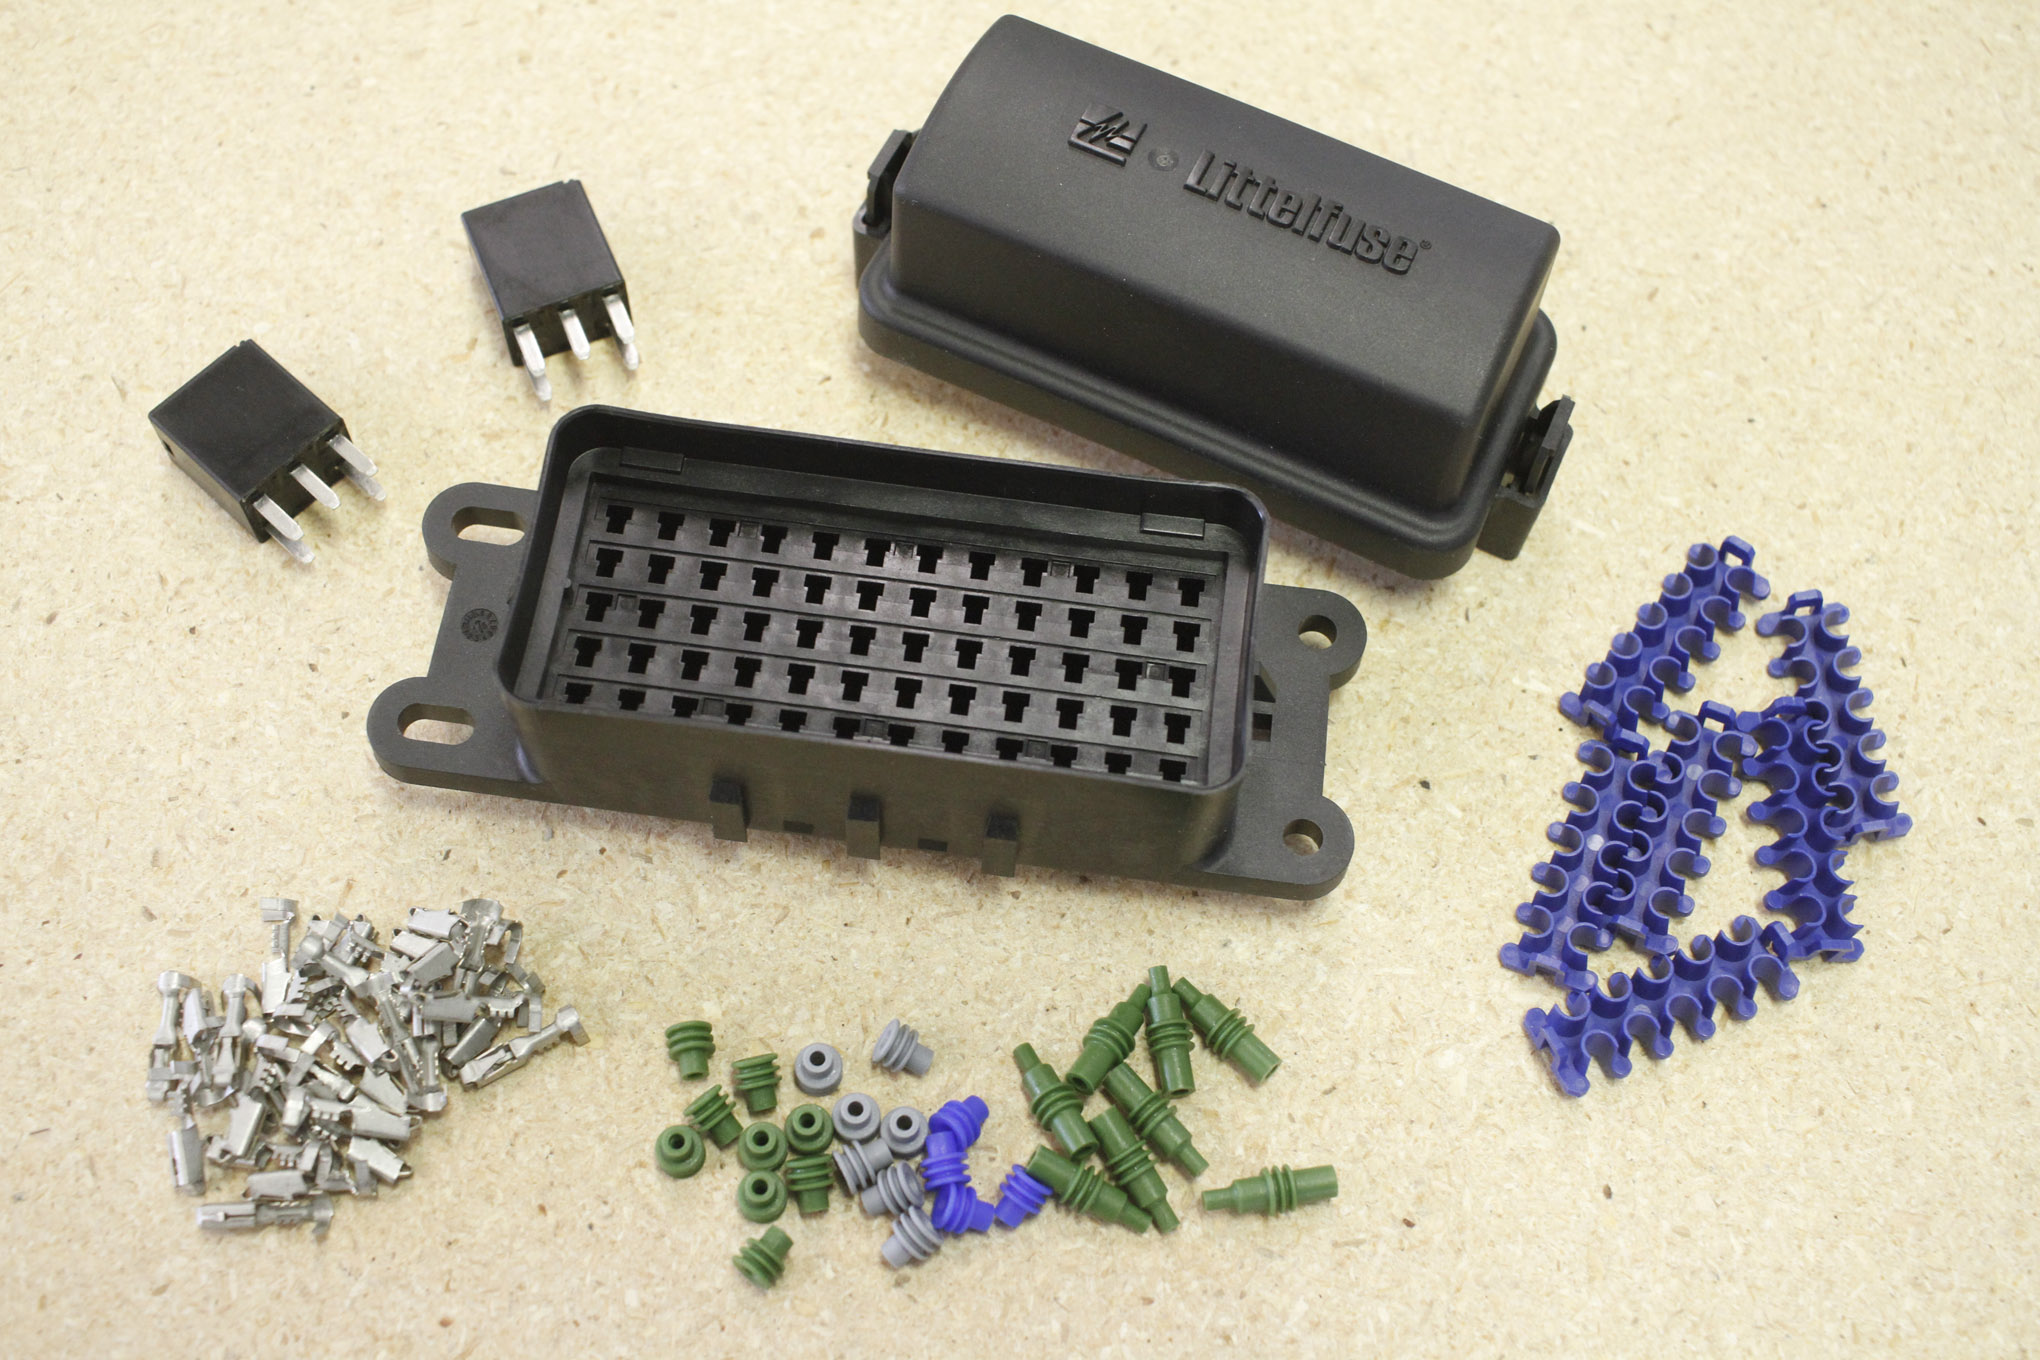 medium resolution of ls1 fuse box pins wiring diagram schemals1 fuse box pins today wiring diagram a 12 pin